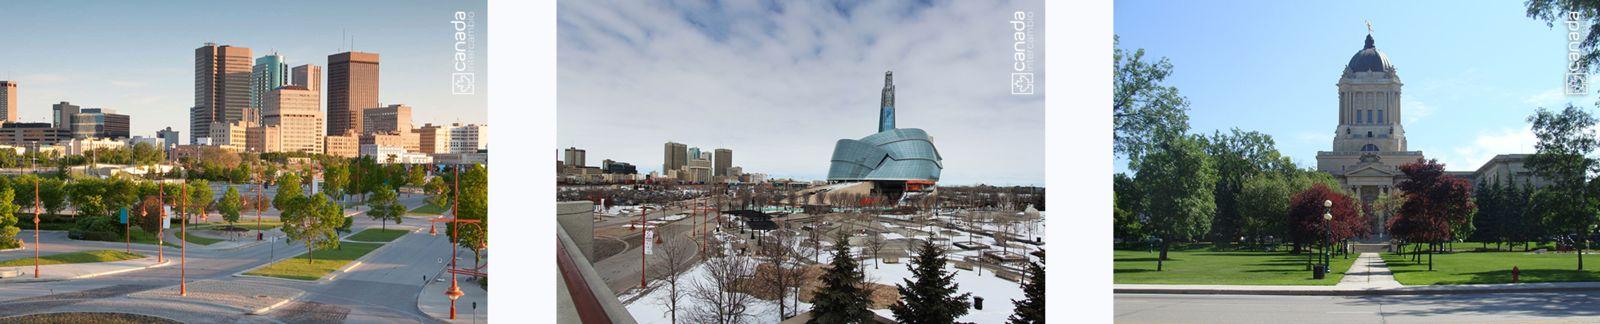 Saiba tudo sobre Winnipeg